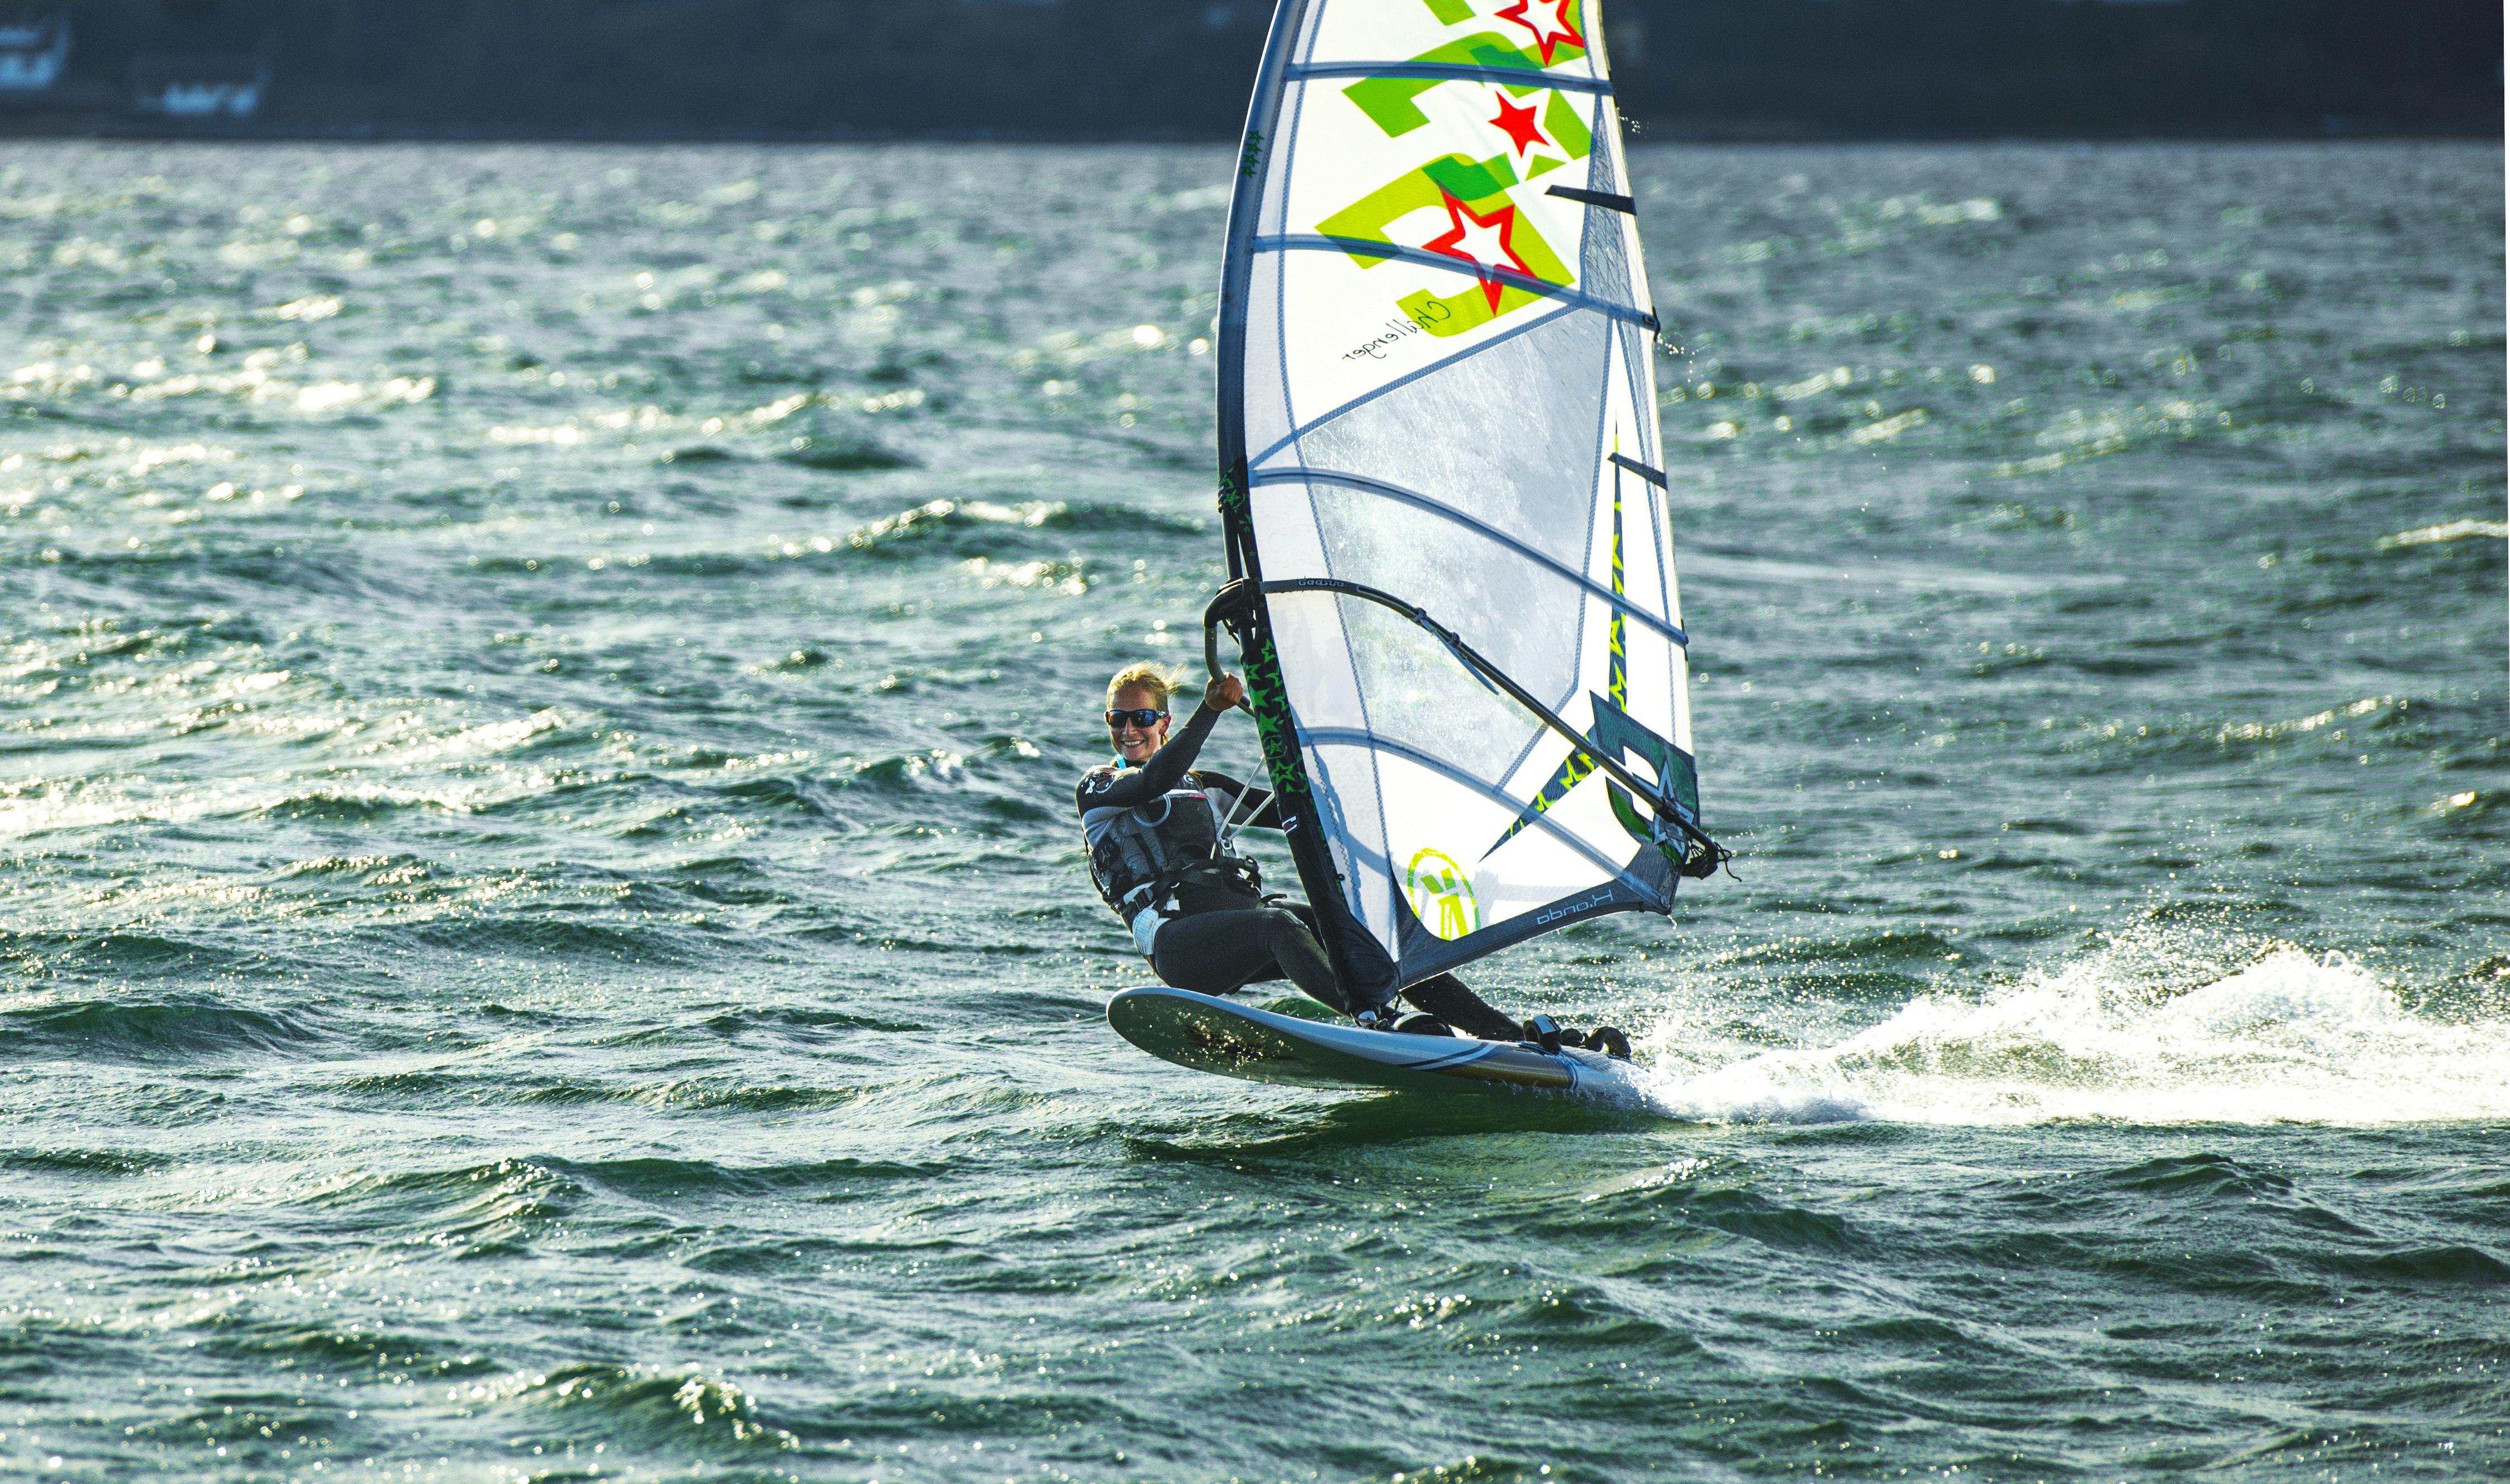 10 reasons why every girl should start windsurfing miriam rasmussen